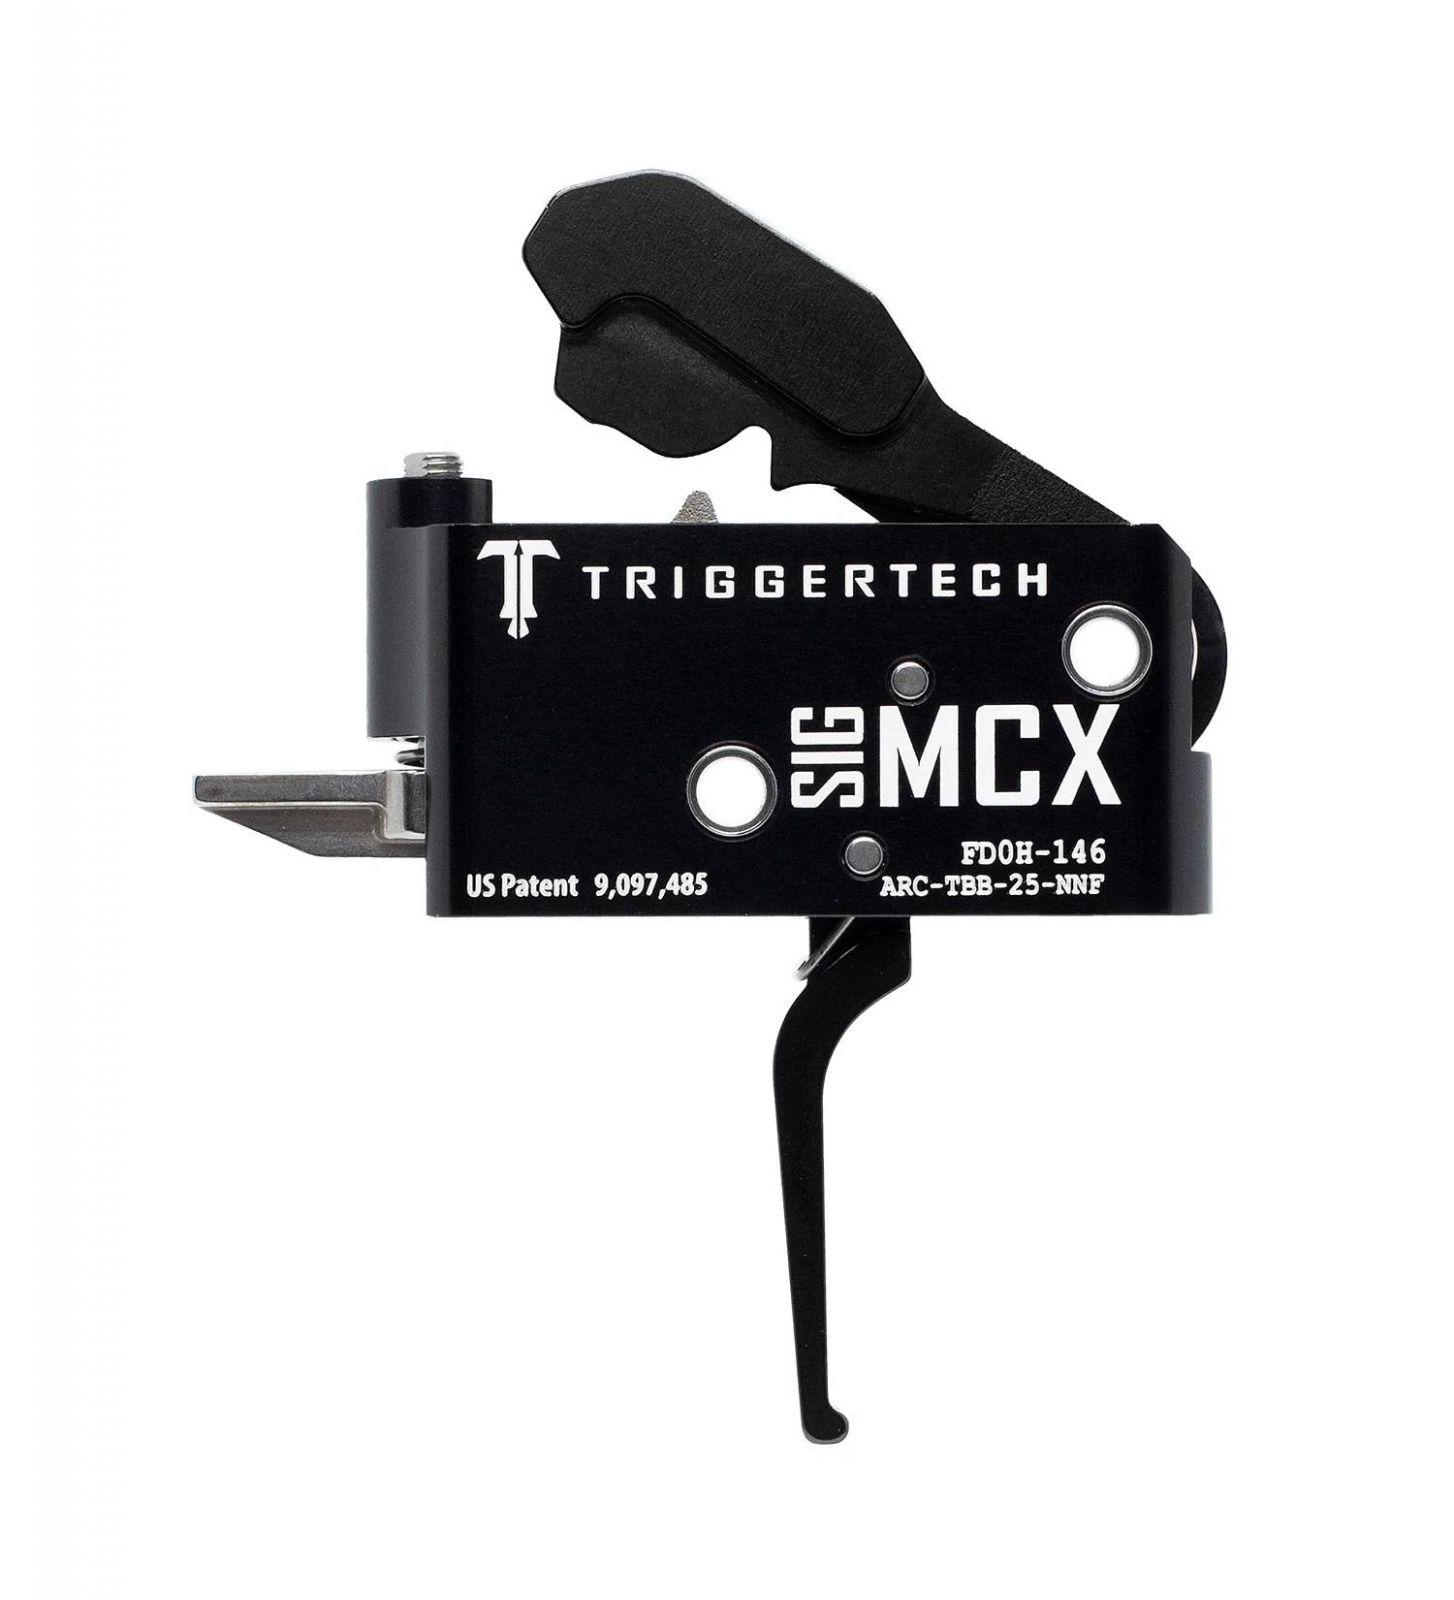 Spoušť TriggerTech SIG MCX Adaptable - rovná, černá